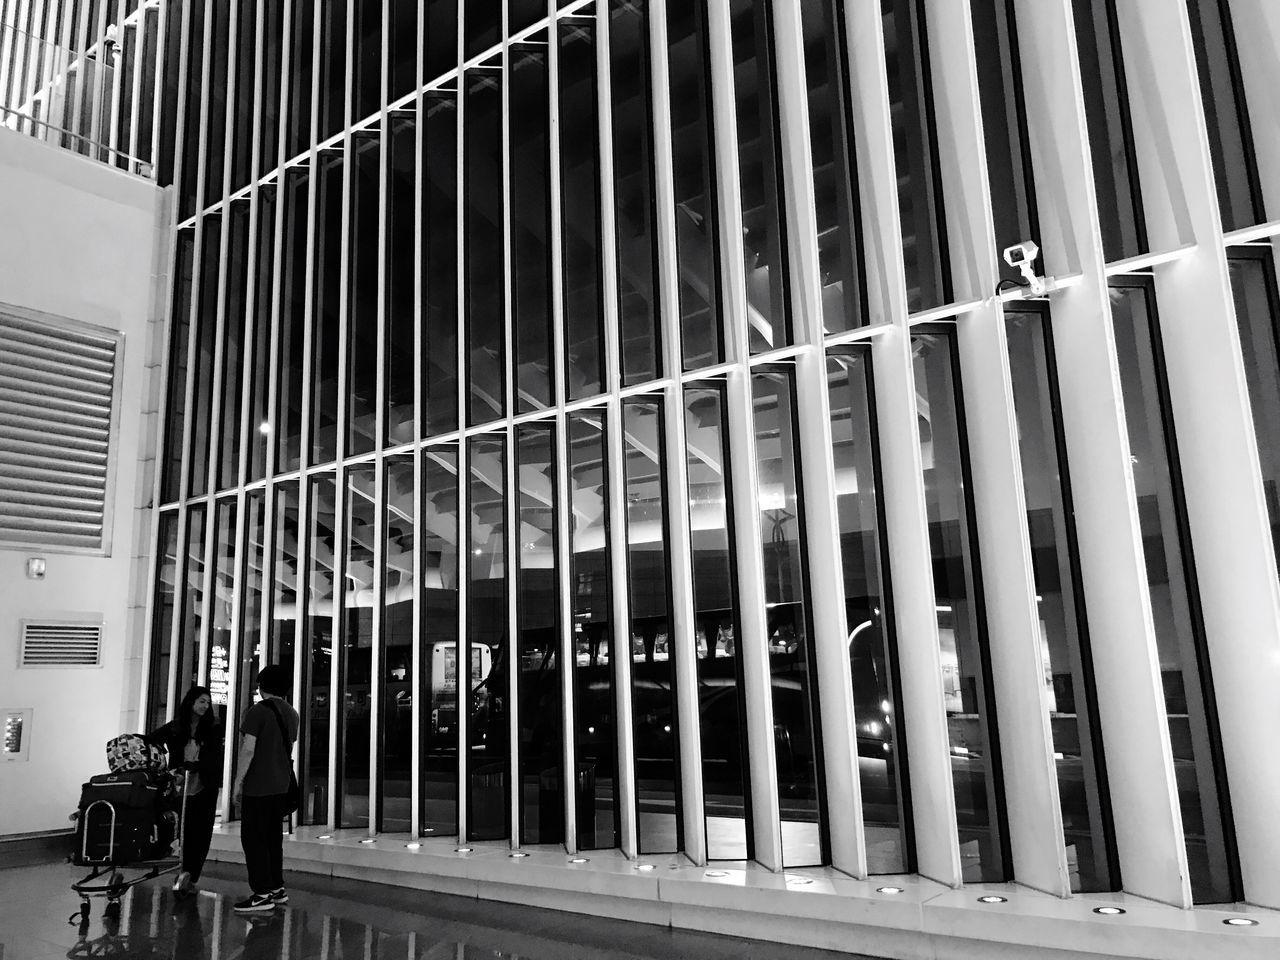 Blackandwhite Airportphotography The Architect - 2017 EyeEm Awards